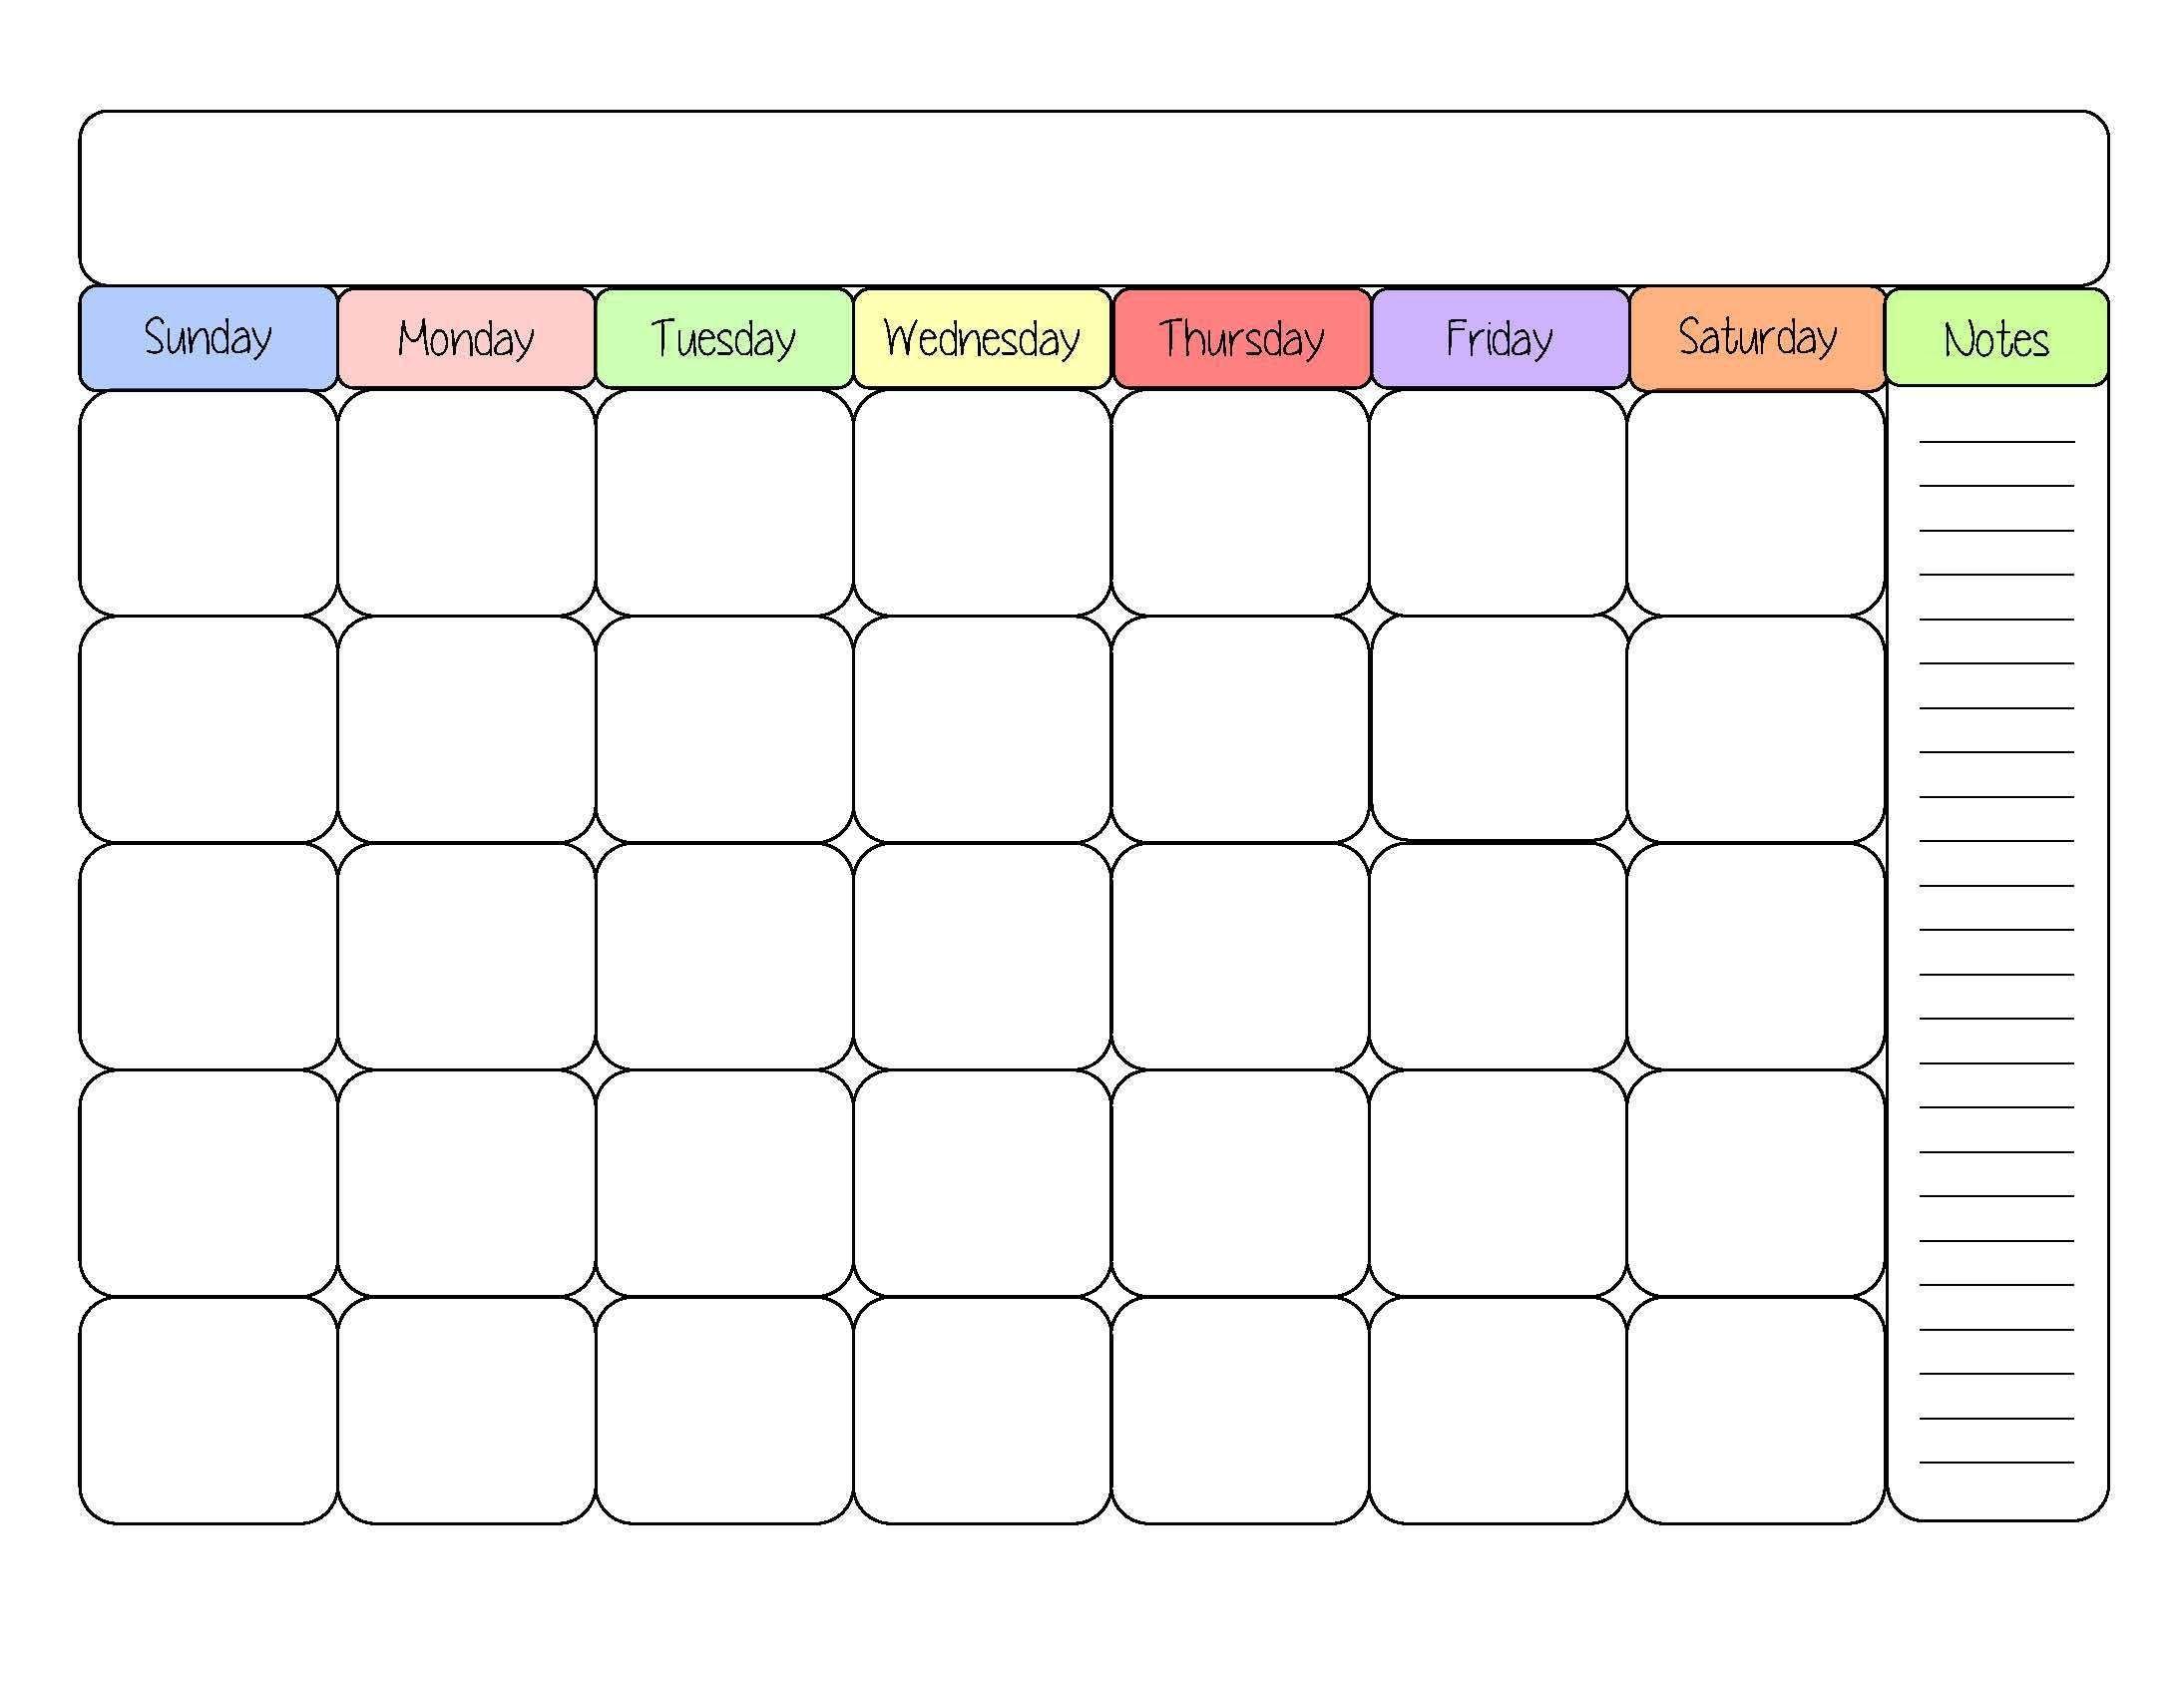 Google Calendar Is Blank